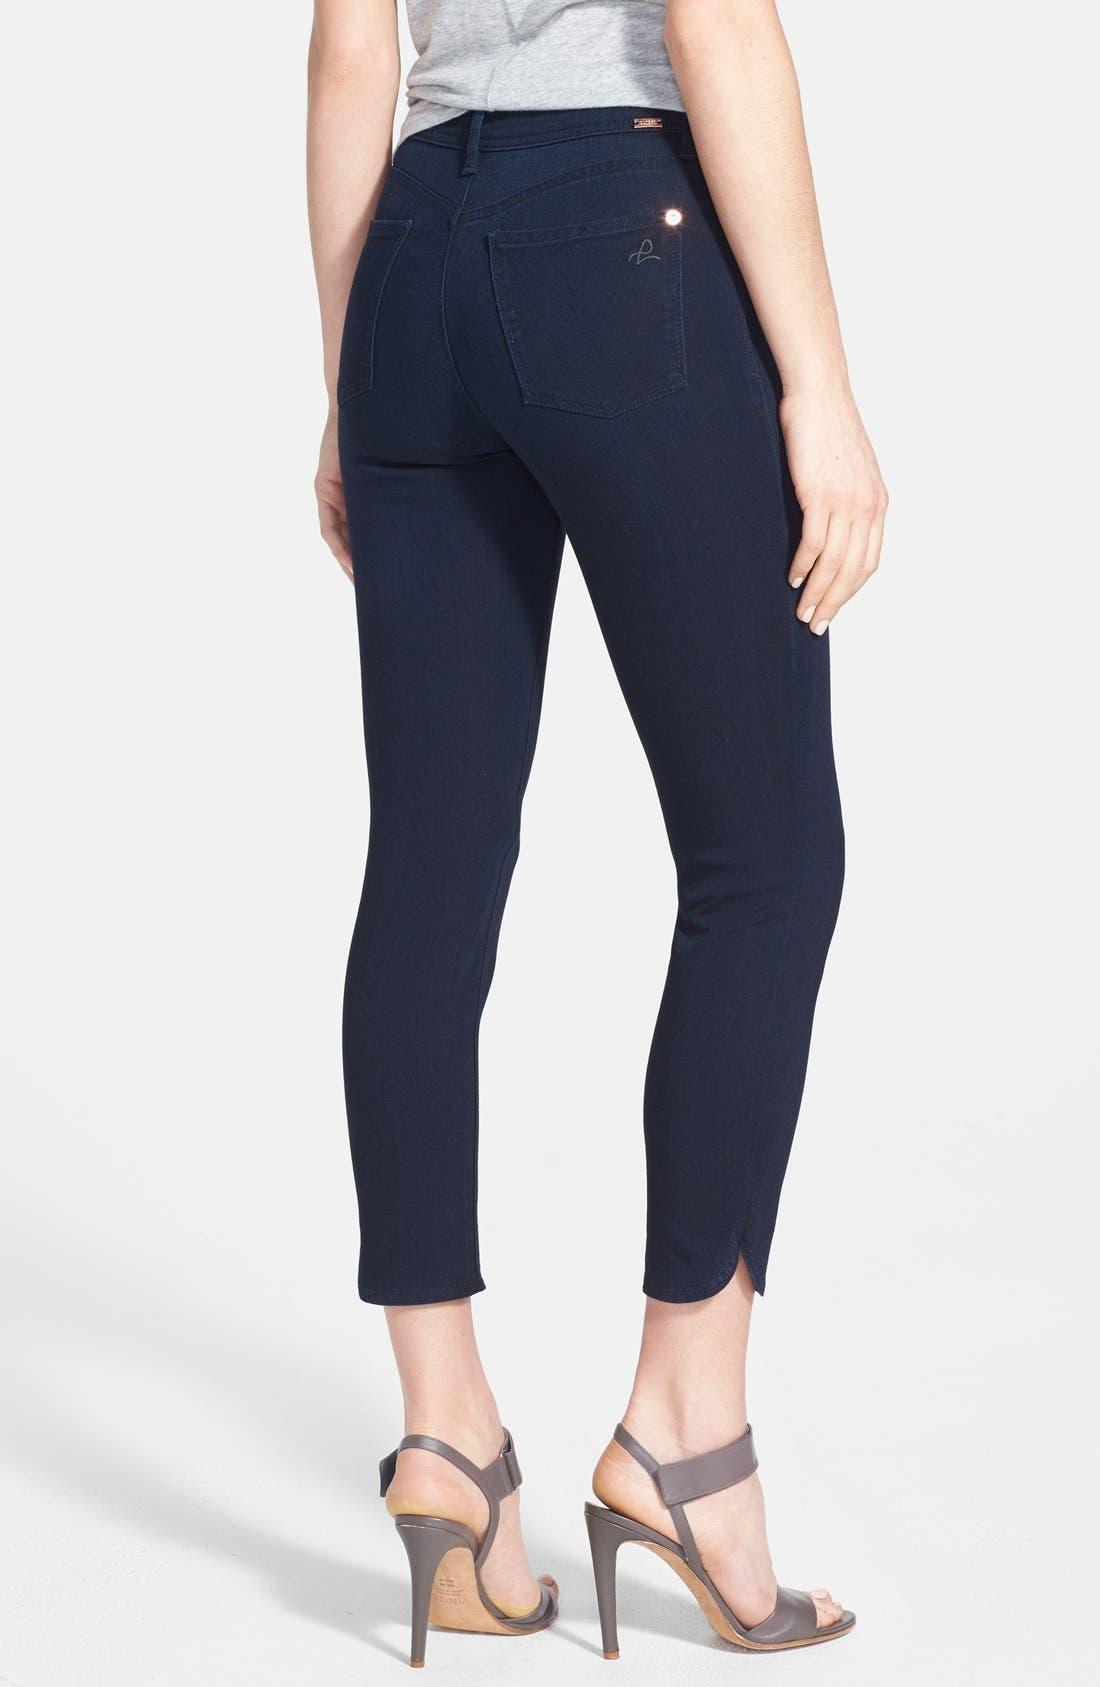 Alternate Image 2  - DL1961 'Bardot High Rise' Crop Jeans (Flat Iron)